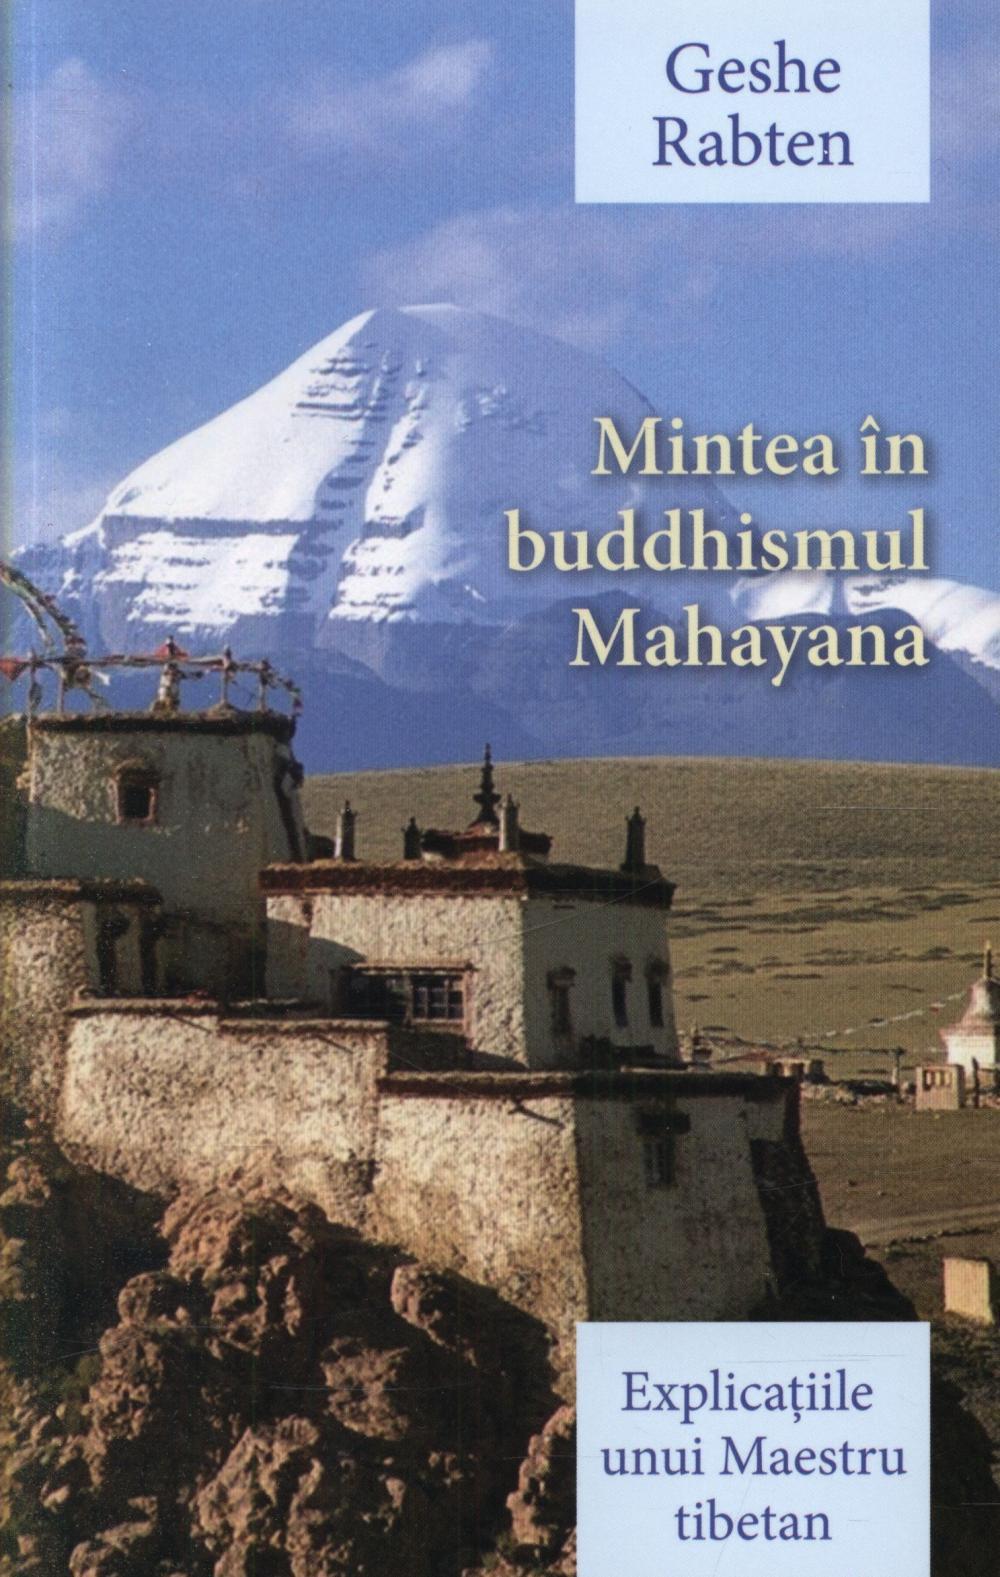 MINTEA IN BUDDHISMUL MAHAYANA